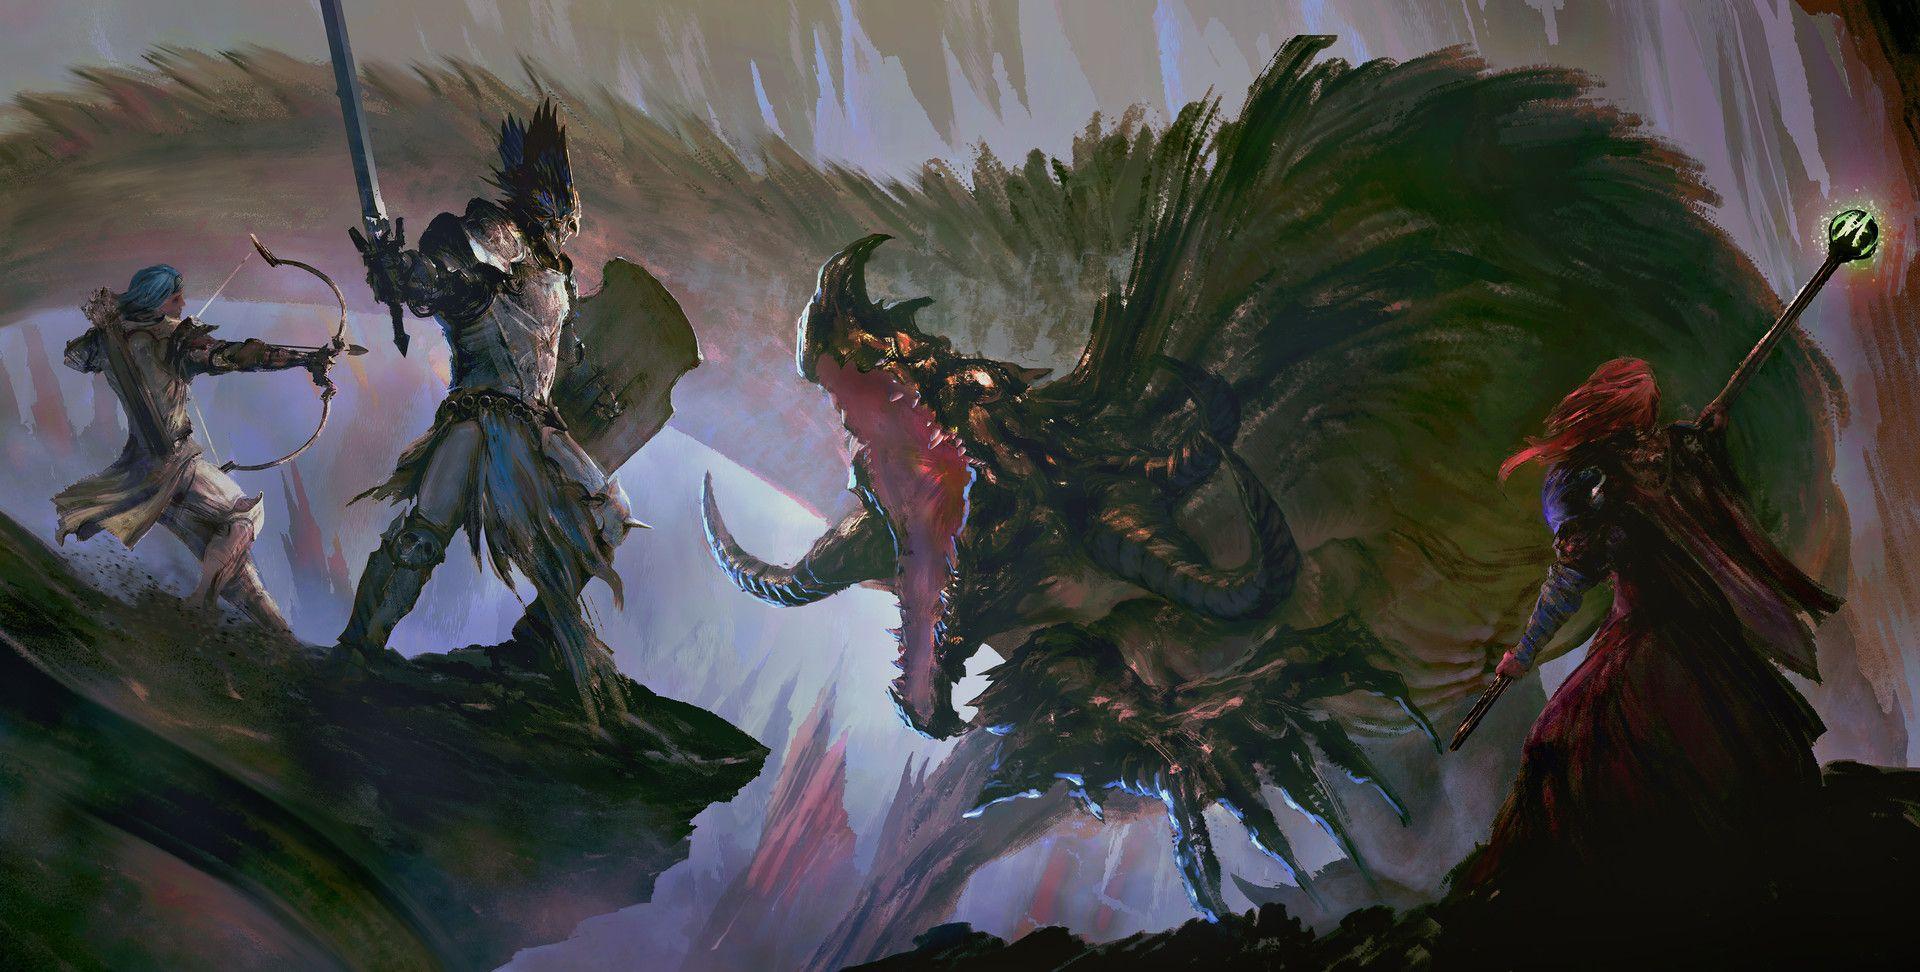 ArtStation - Dragon Slayers - Descent, Felix Ortiz